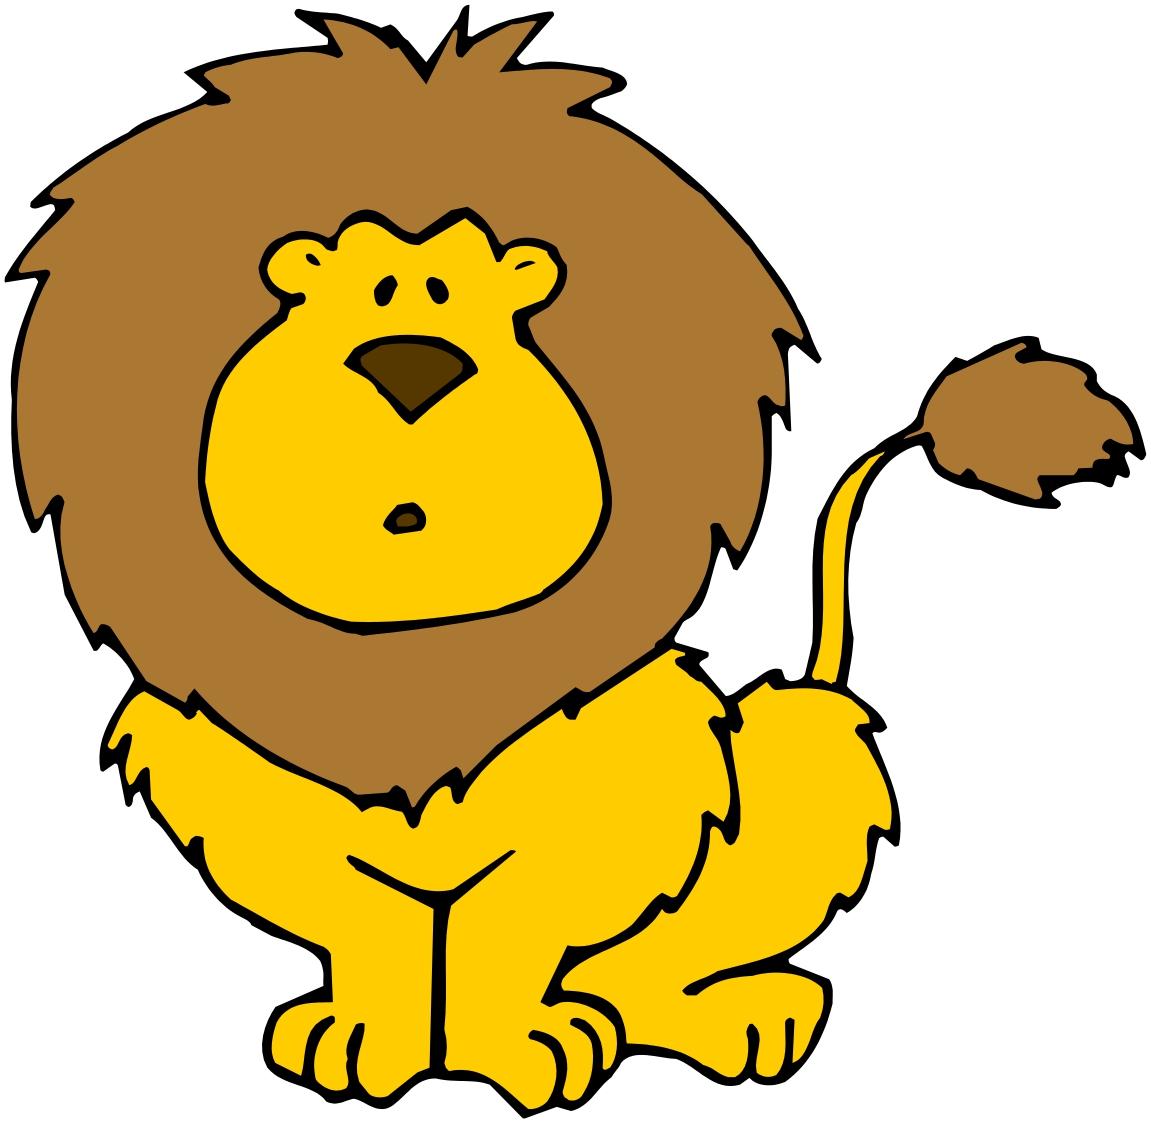 free clipart images lions - photo #27